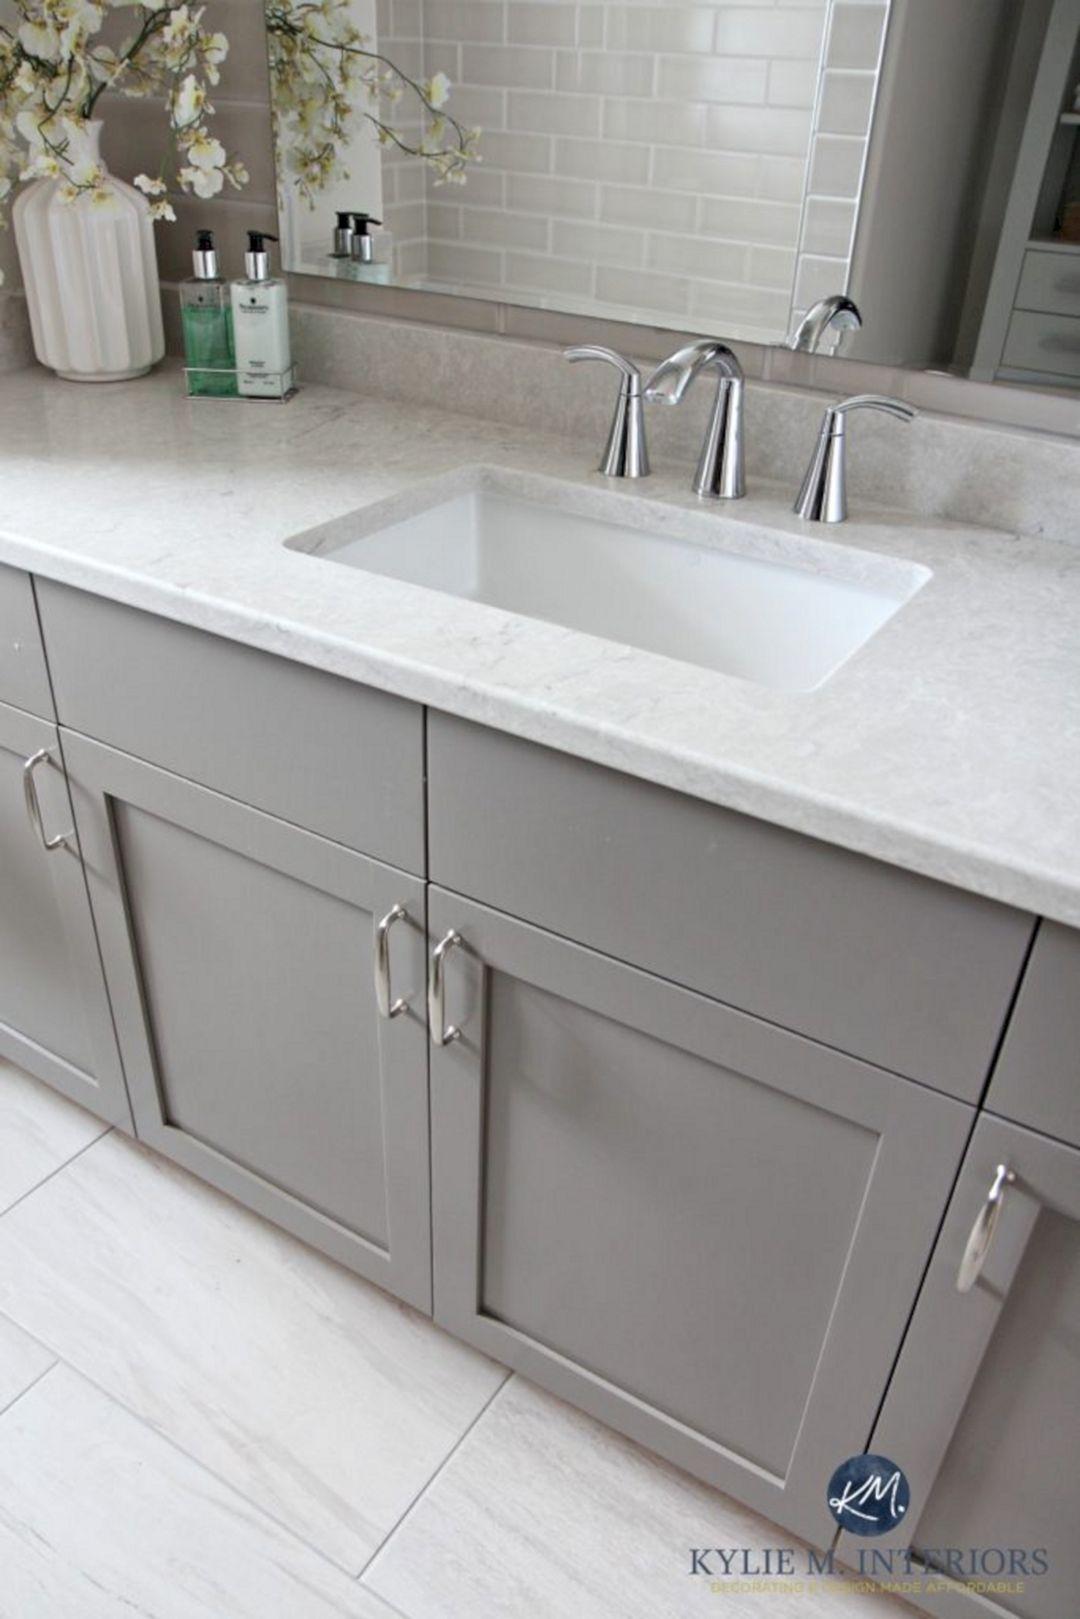 Beautiful Bathroom Tile Design (Beautiful Bathroom Tile Design) design ideas and photos #bathroomtiledesigns